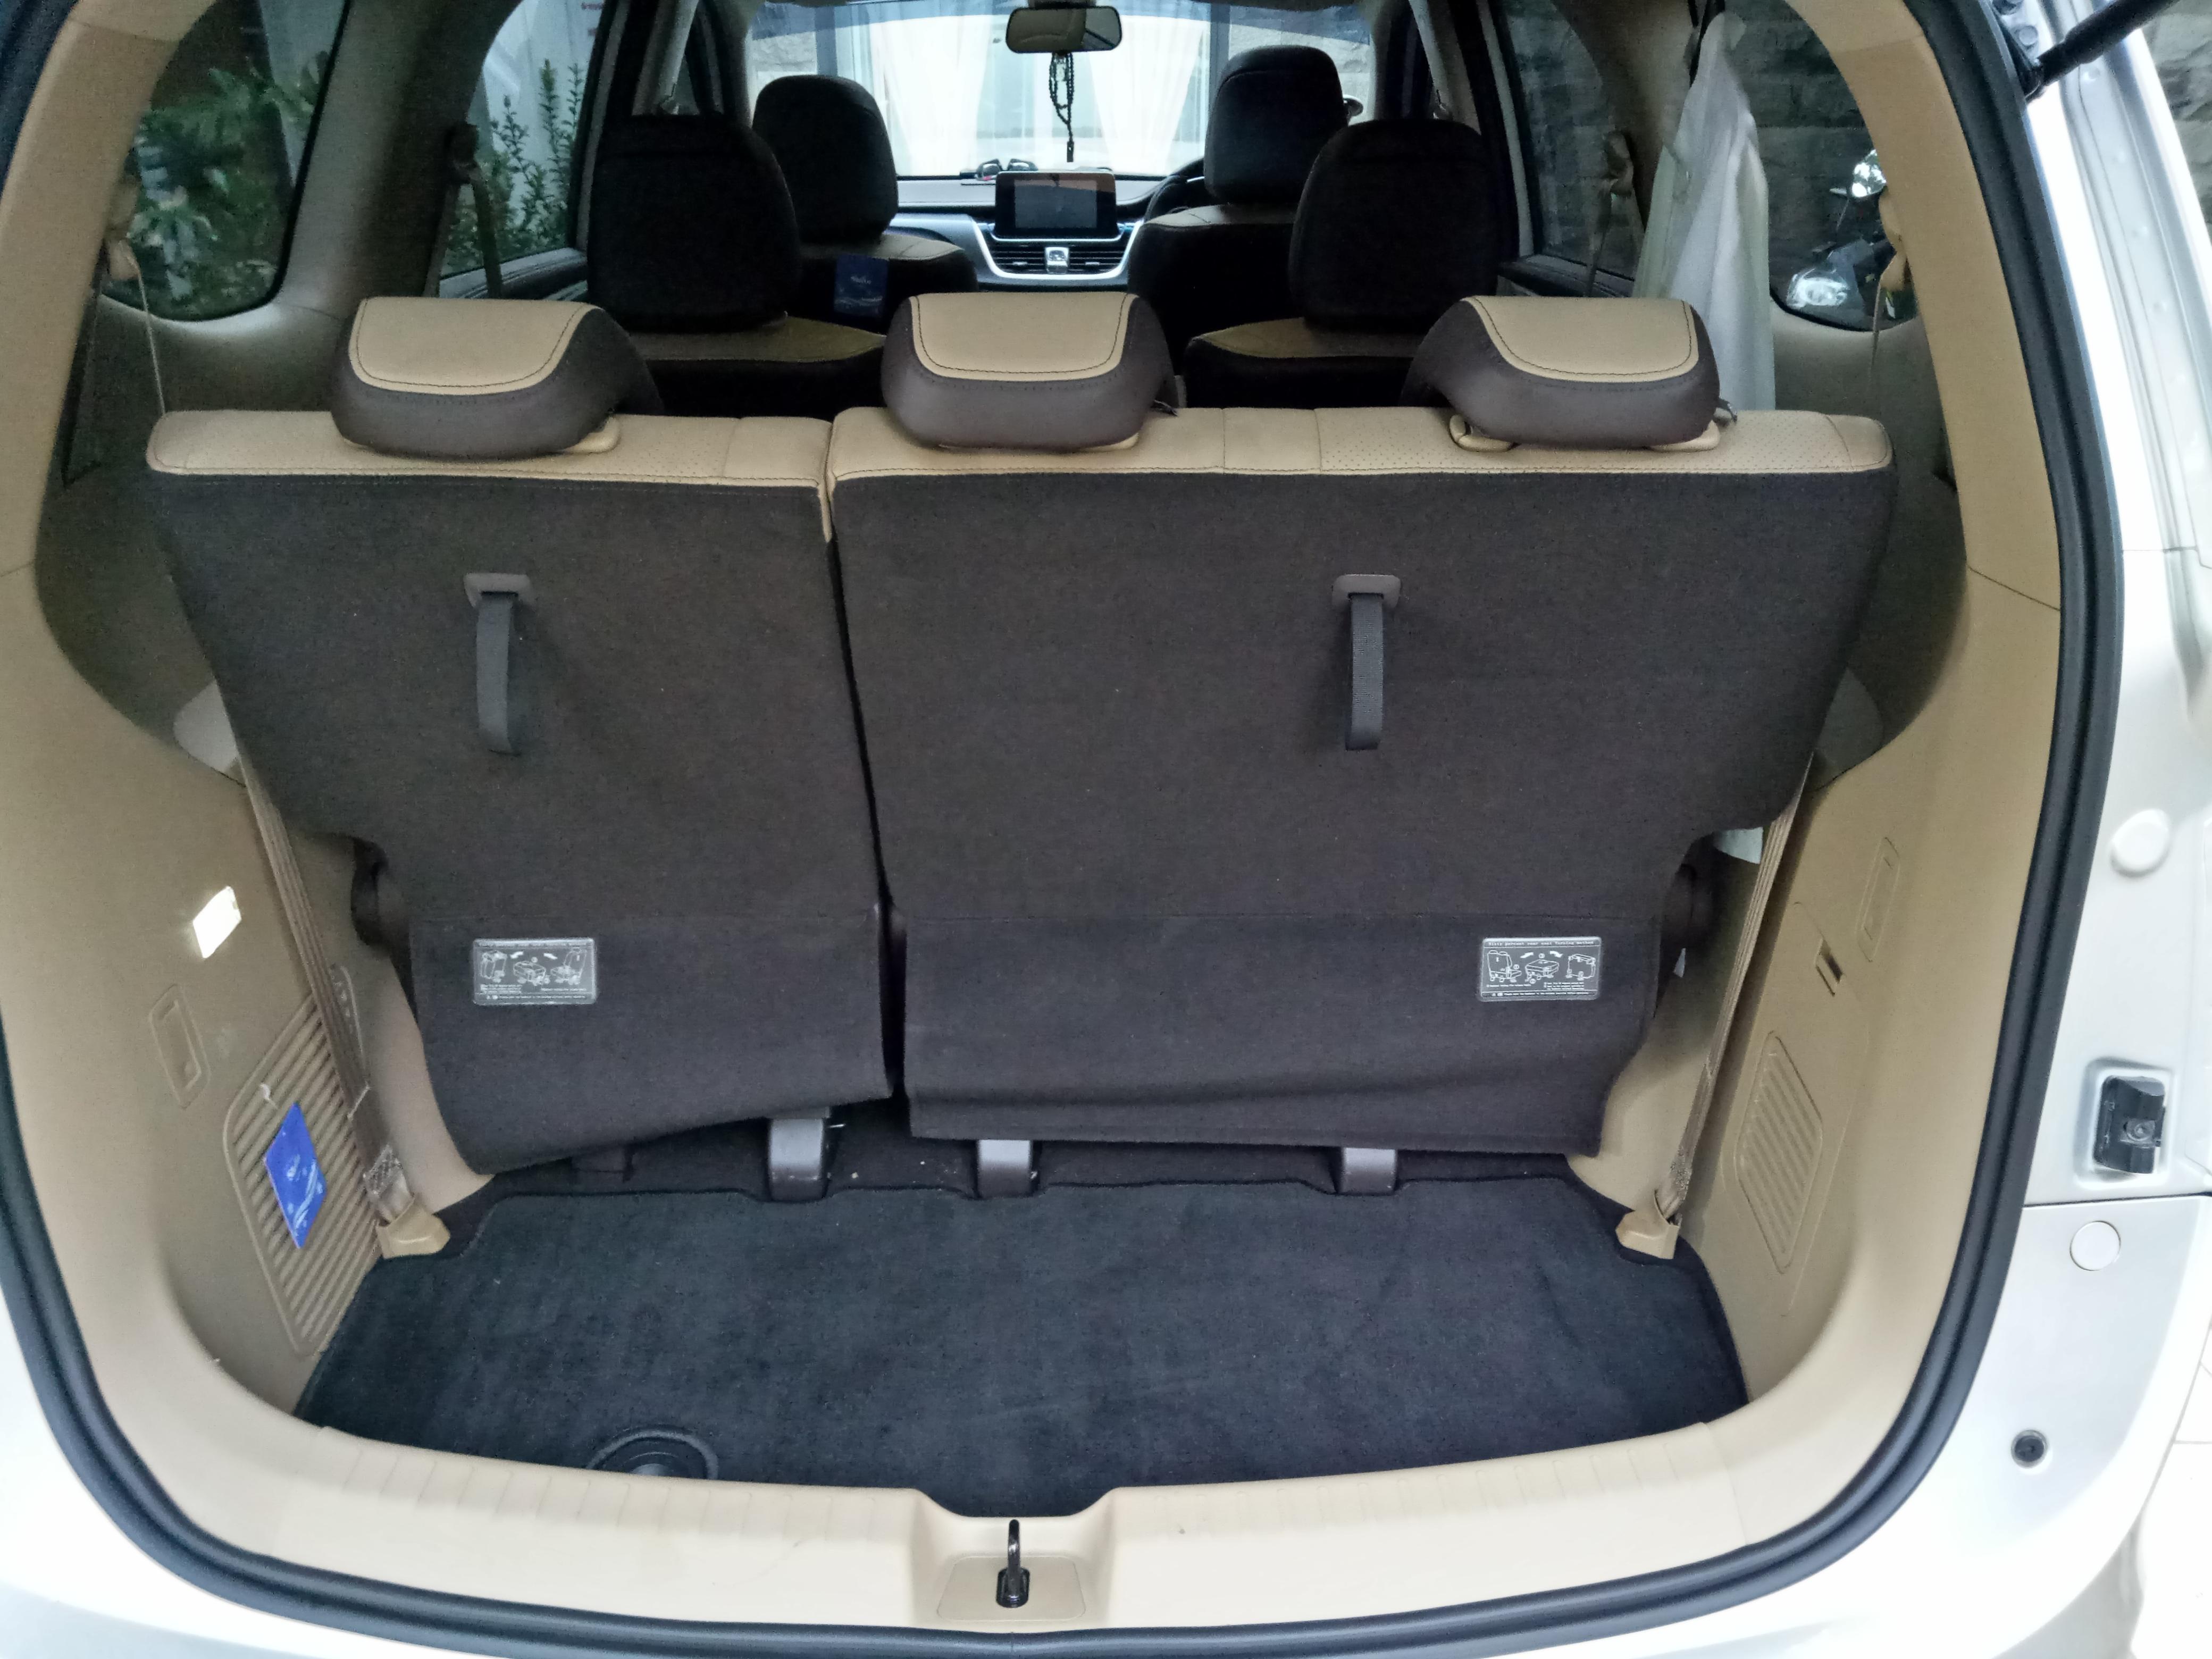 Third Row 60:40 Seat Configuration